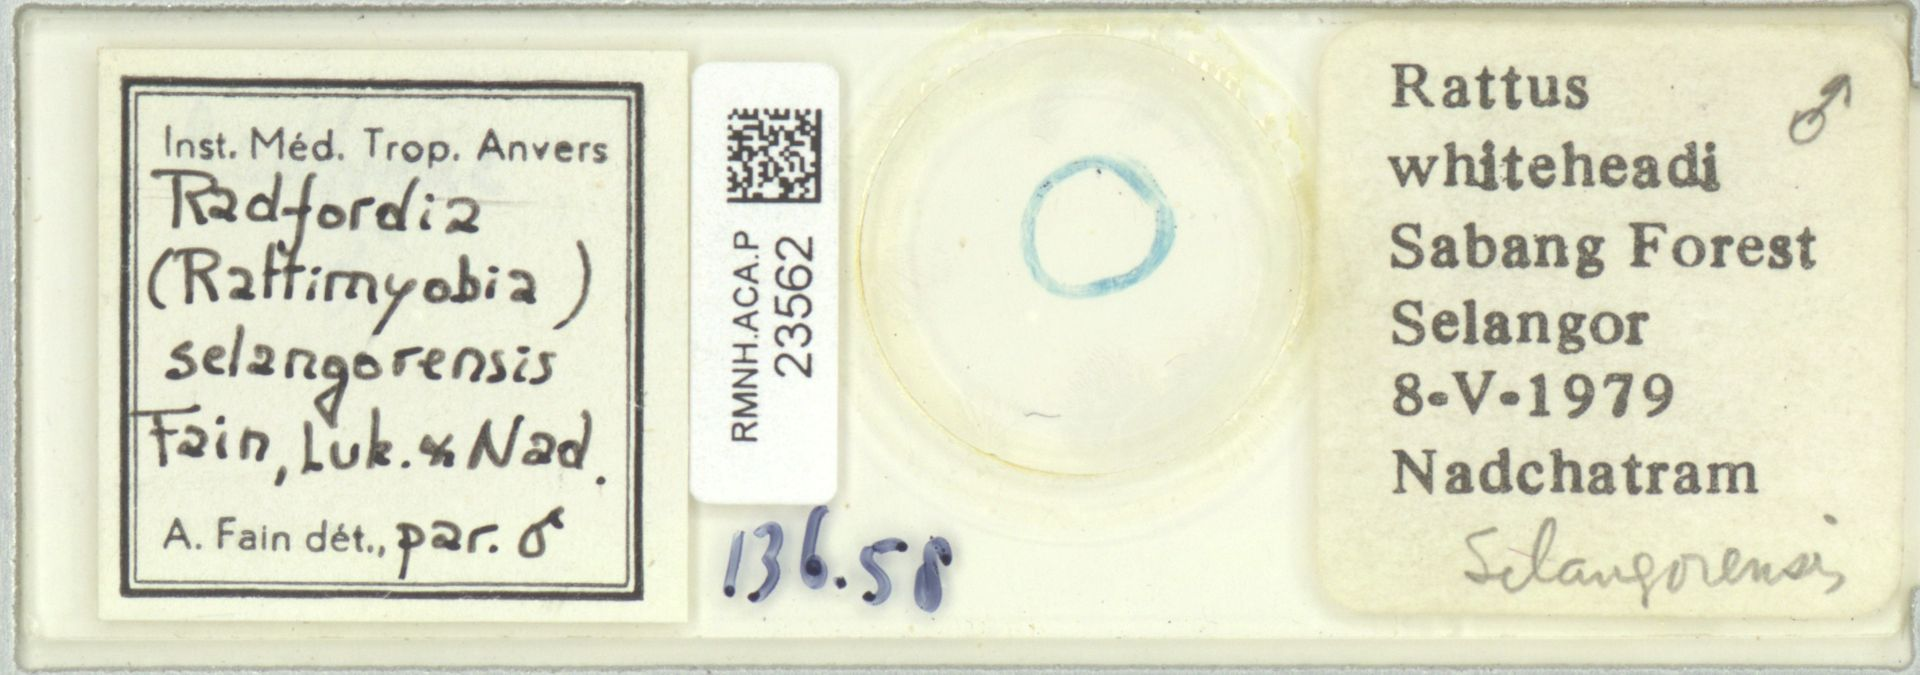 RMNH.ACA.P.23562 | Radfordia (Rattimyobia) selangorensis Fain, Luk & Nad.